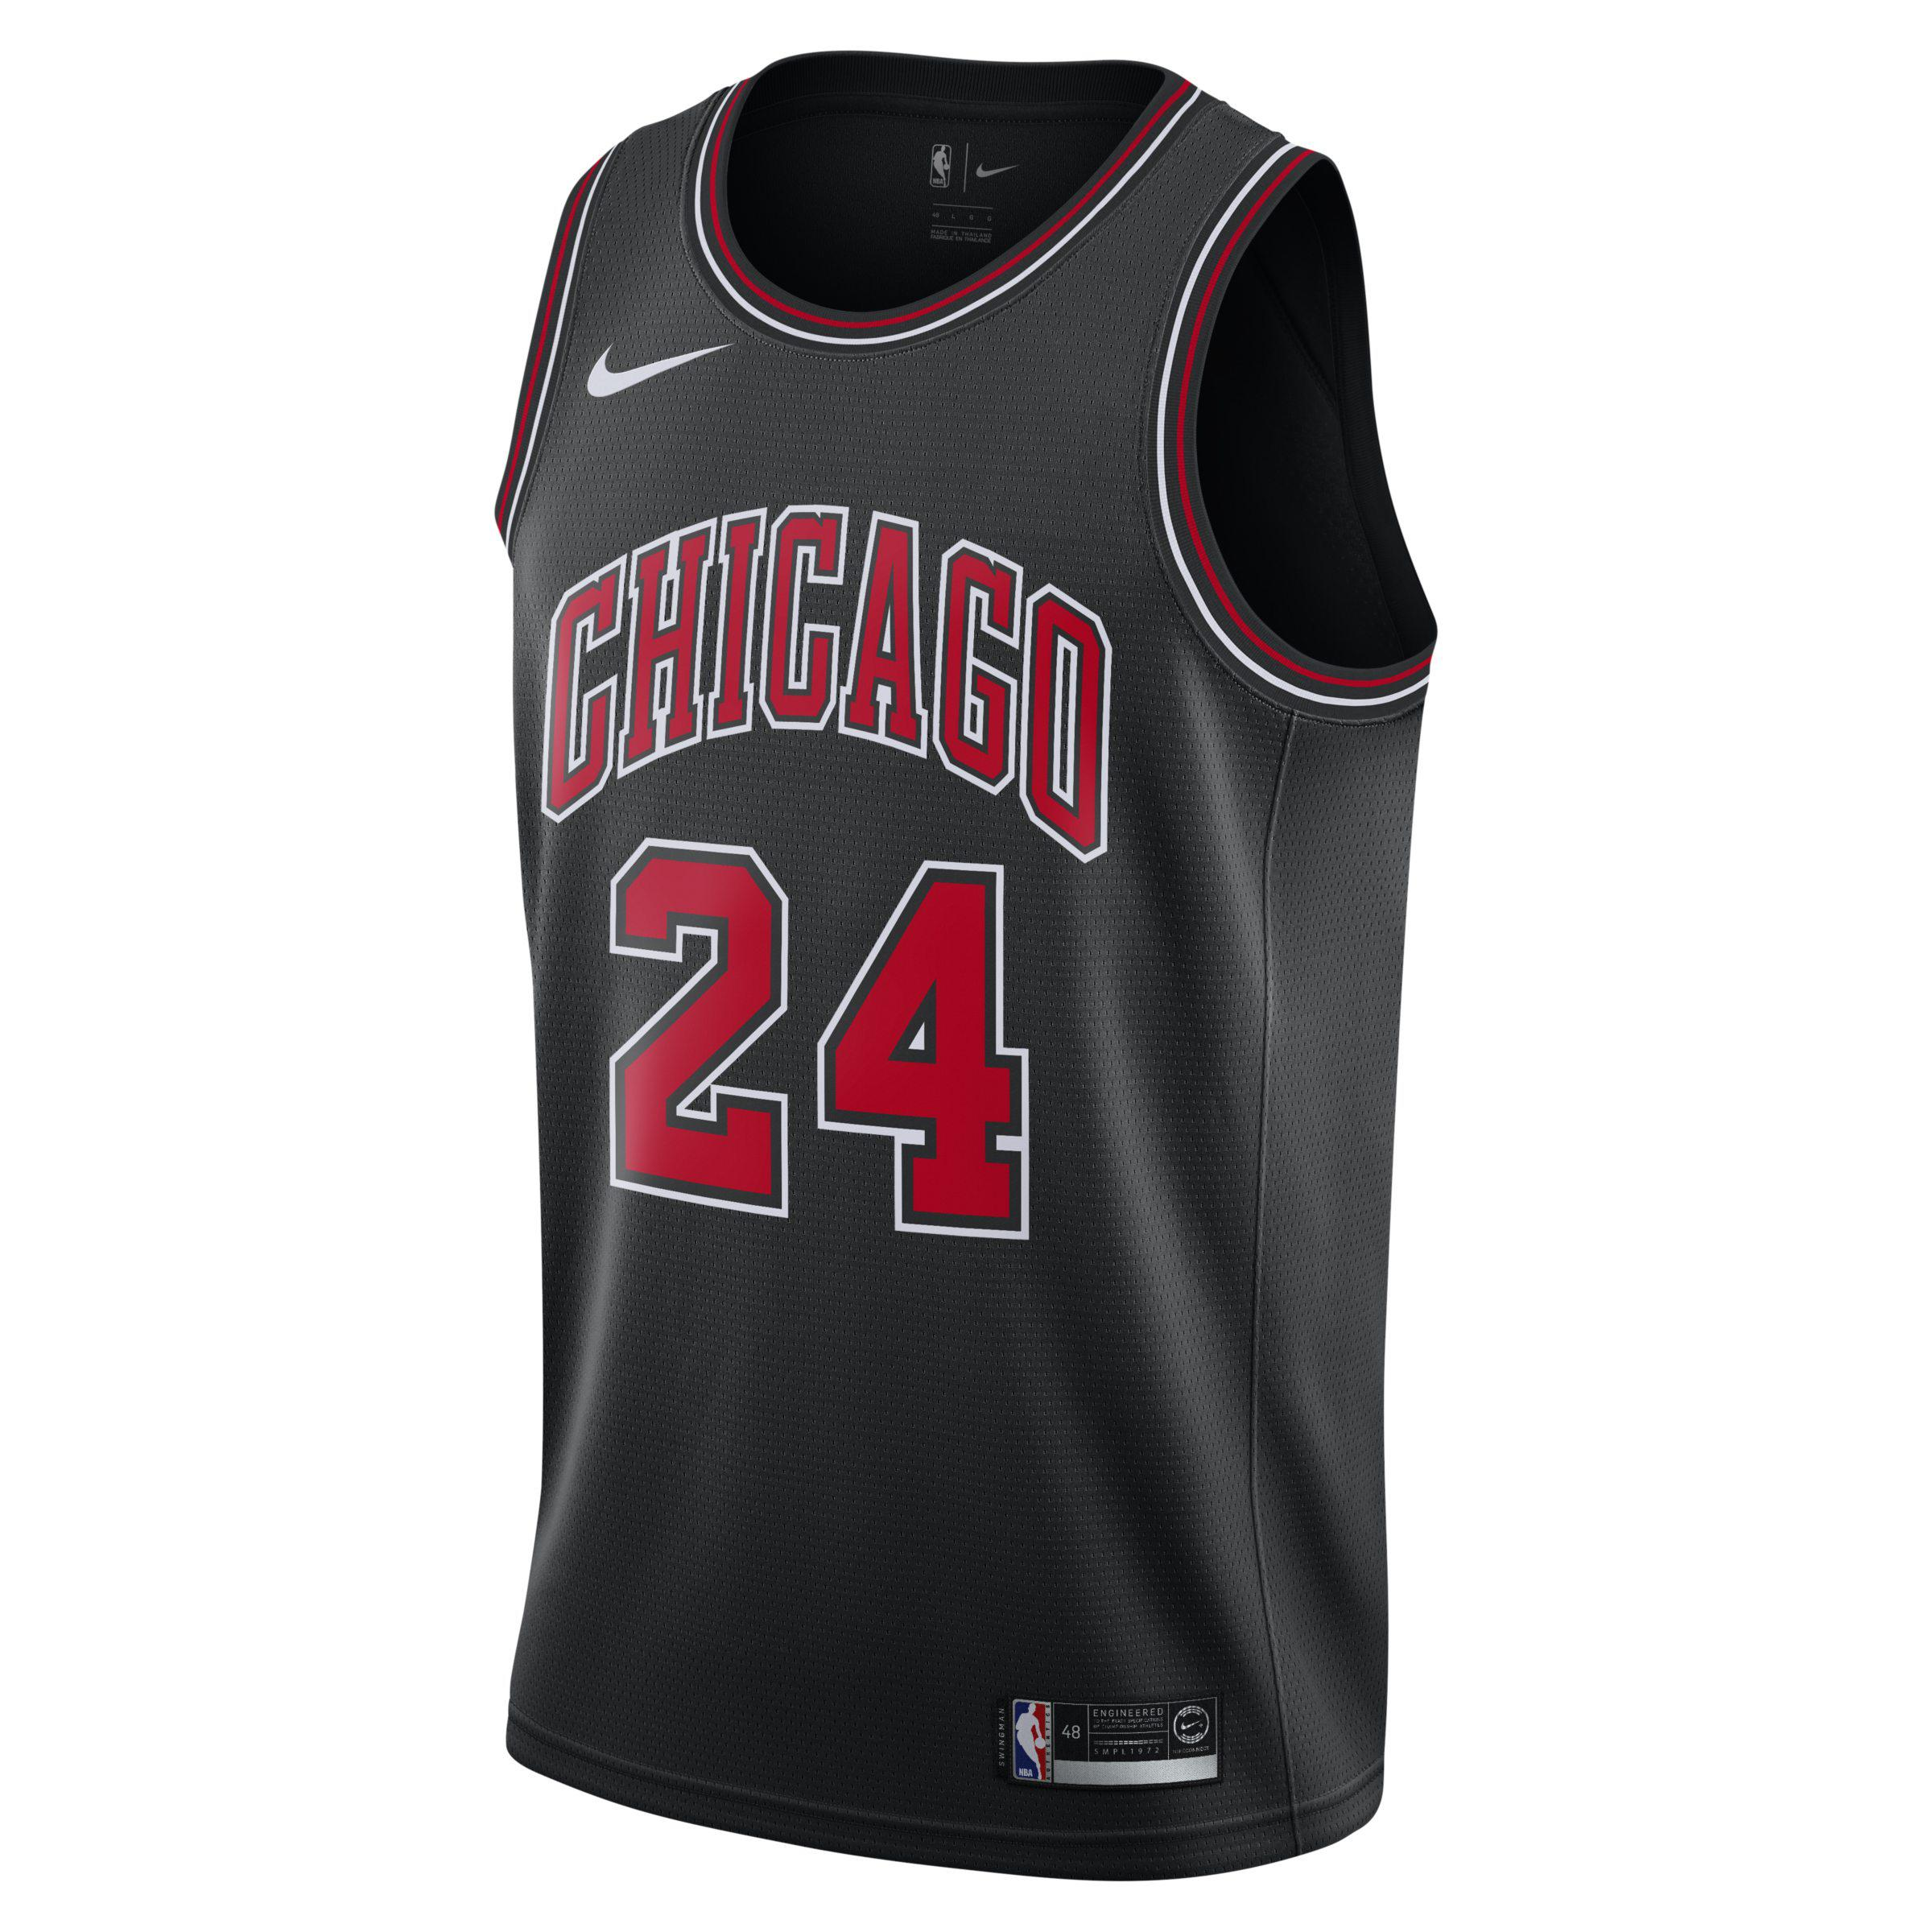 1905c98b118f Nike. Black Lauri Markkanen Statement Edition Swingman (chicago Bulls) Nba  Connected Jersey